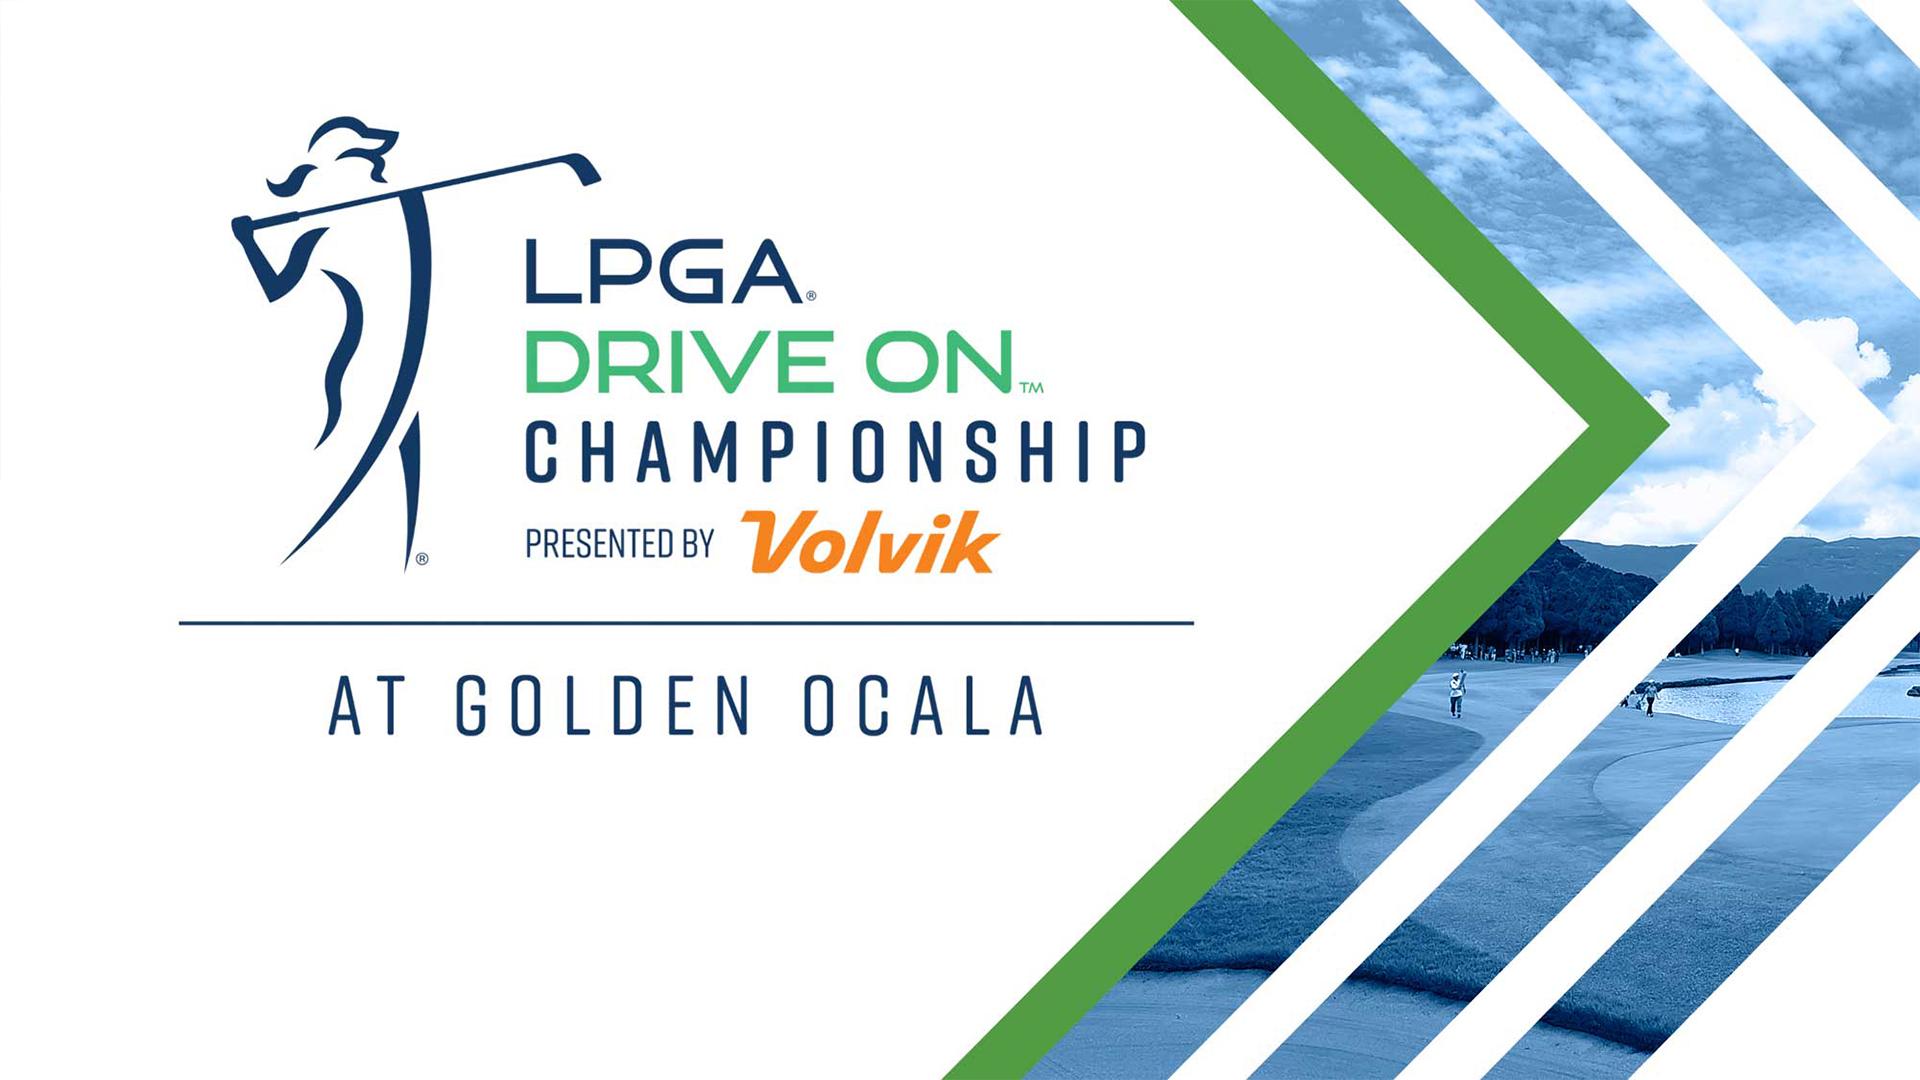 Volvik to Sponsor LPGA Drive On Championship